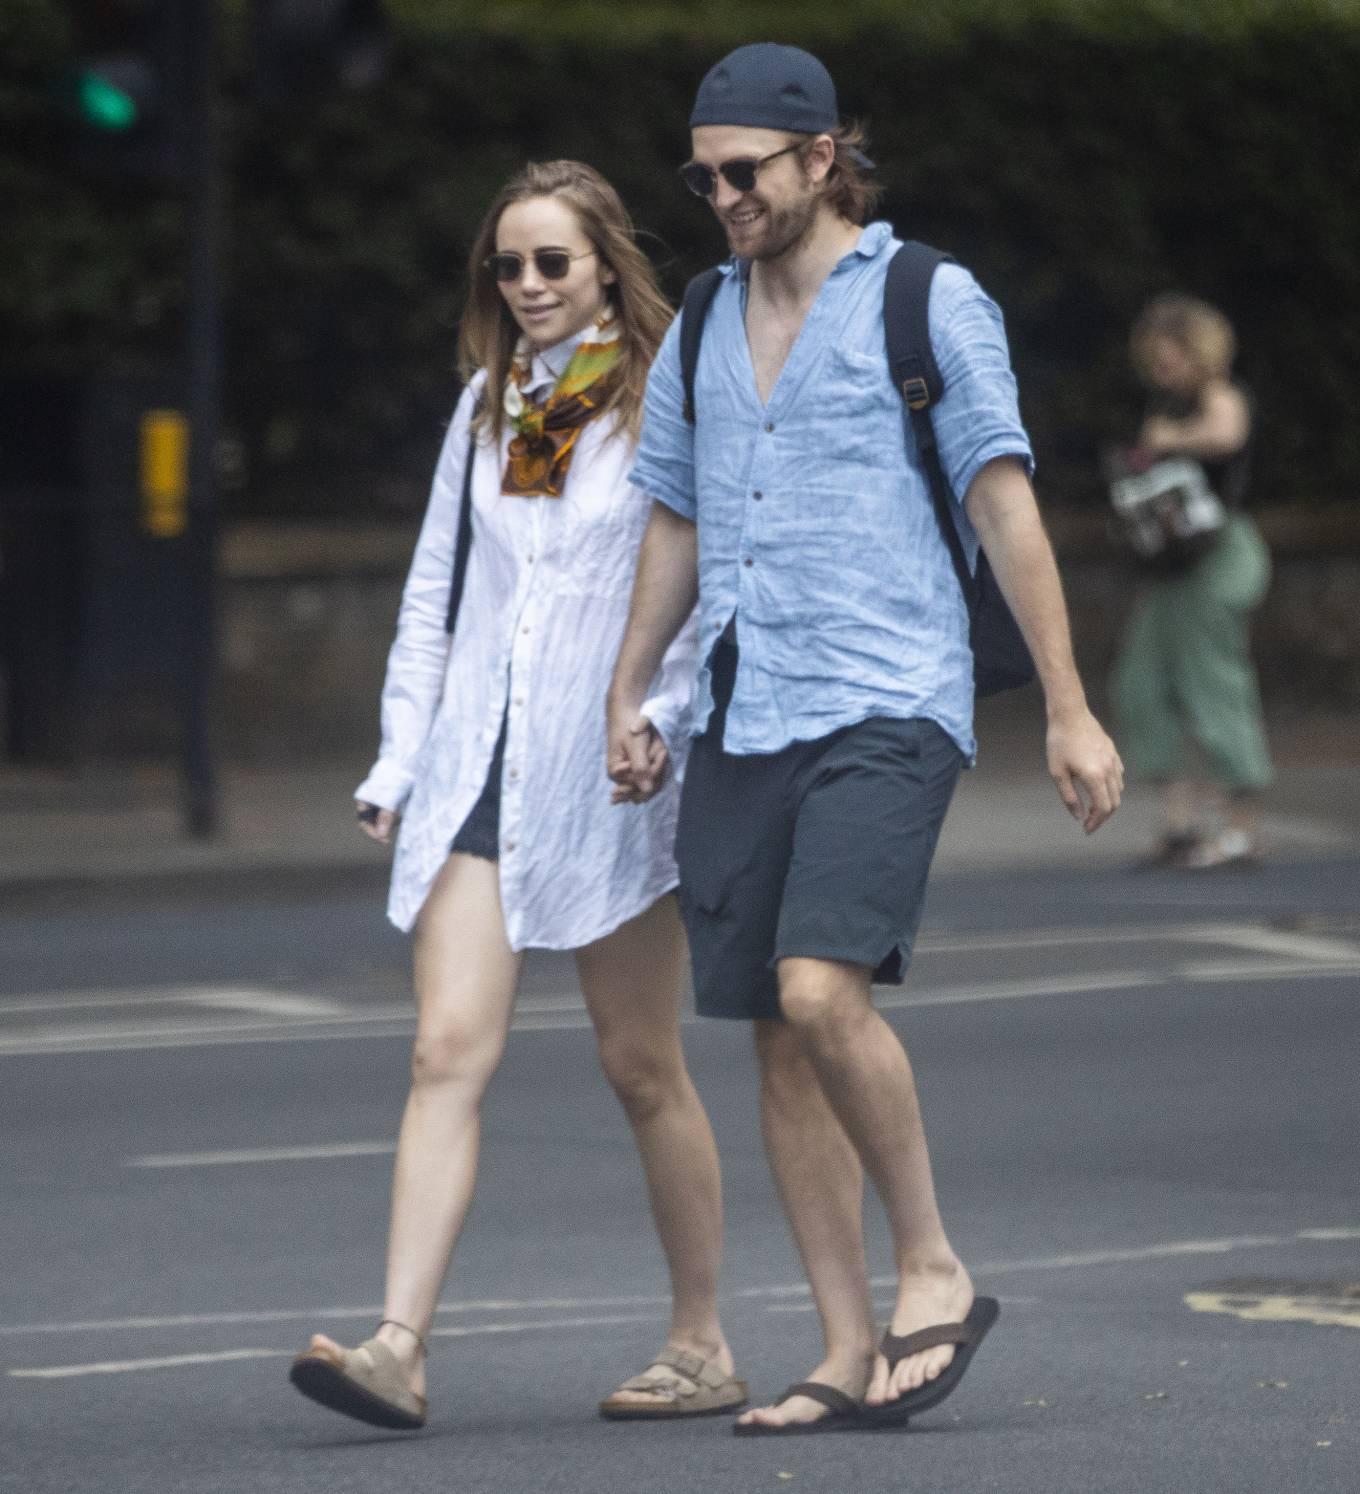 Suki Waterhouse 2020 : Suki Waterhouse and Robert Pattinson – Out in London-42